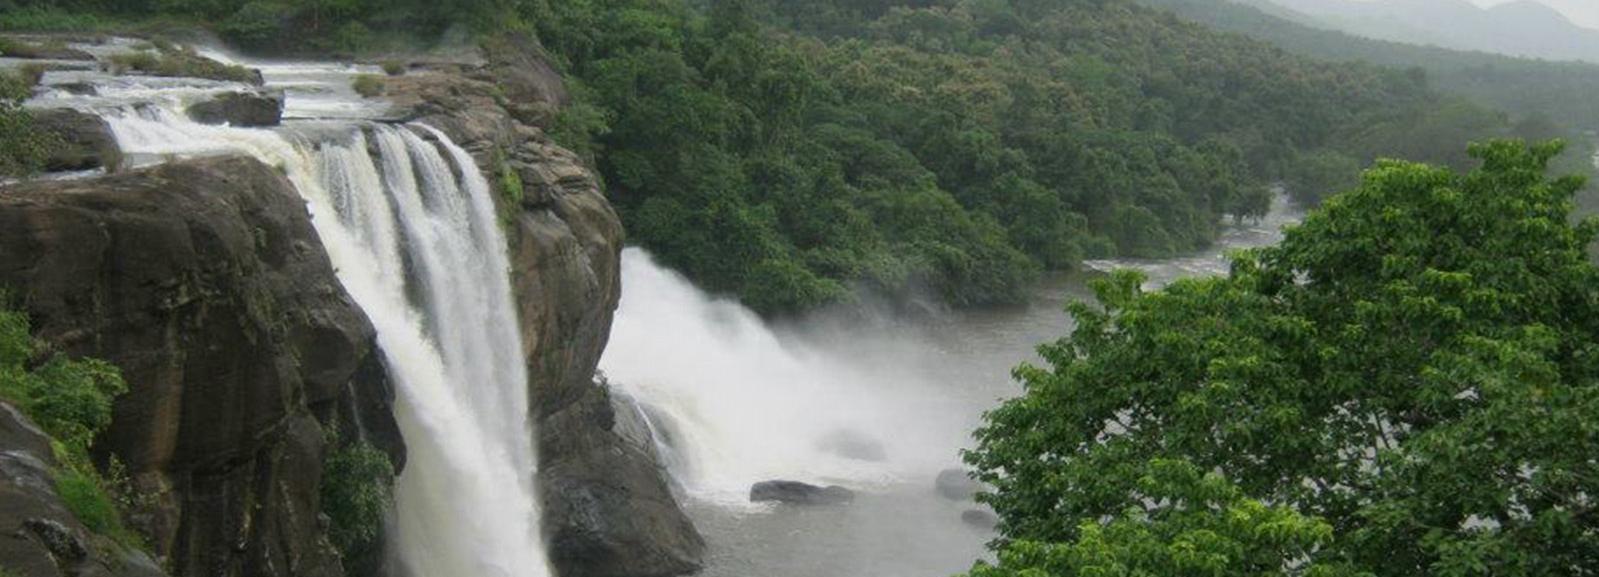 Excursión de la cascada de Athirappilly con almuerzo de Cochin